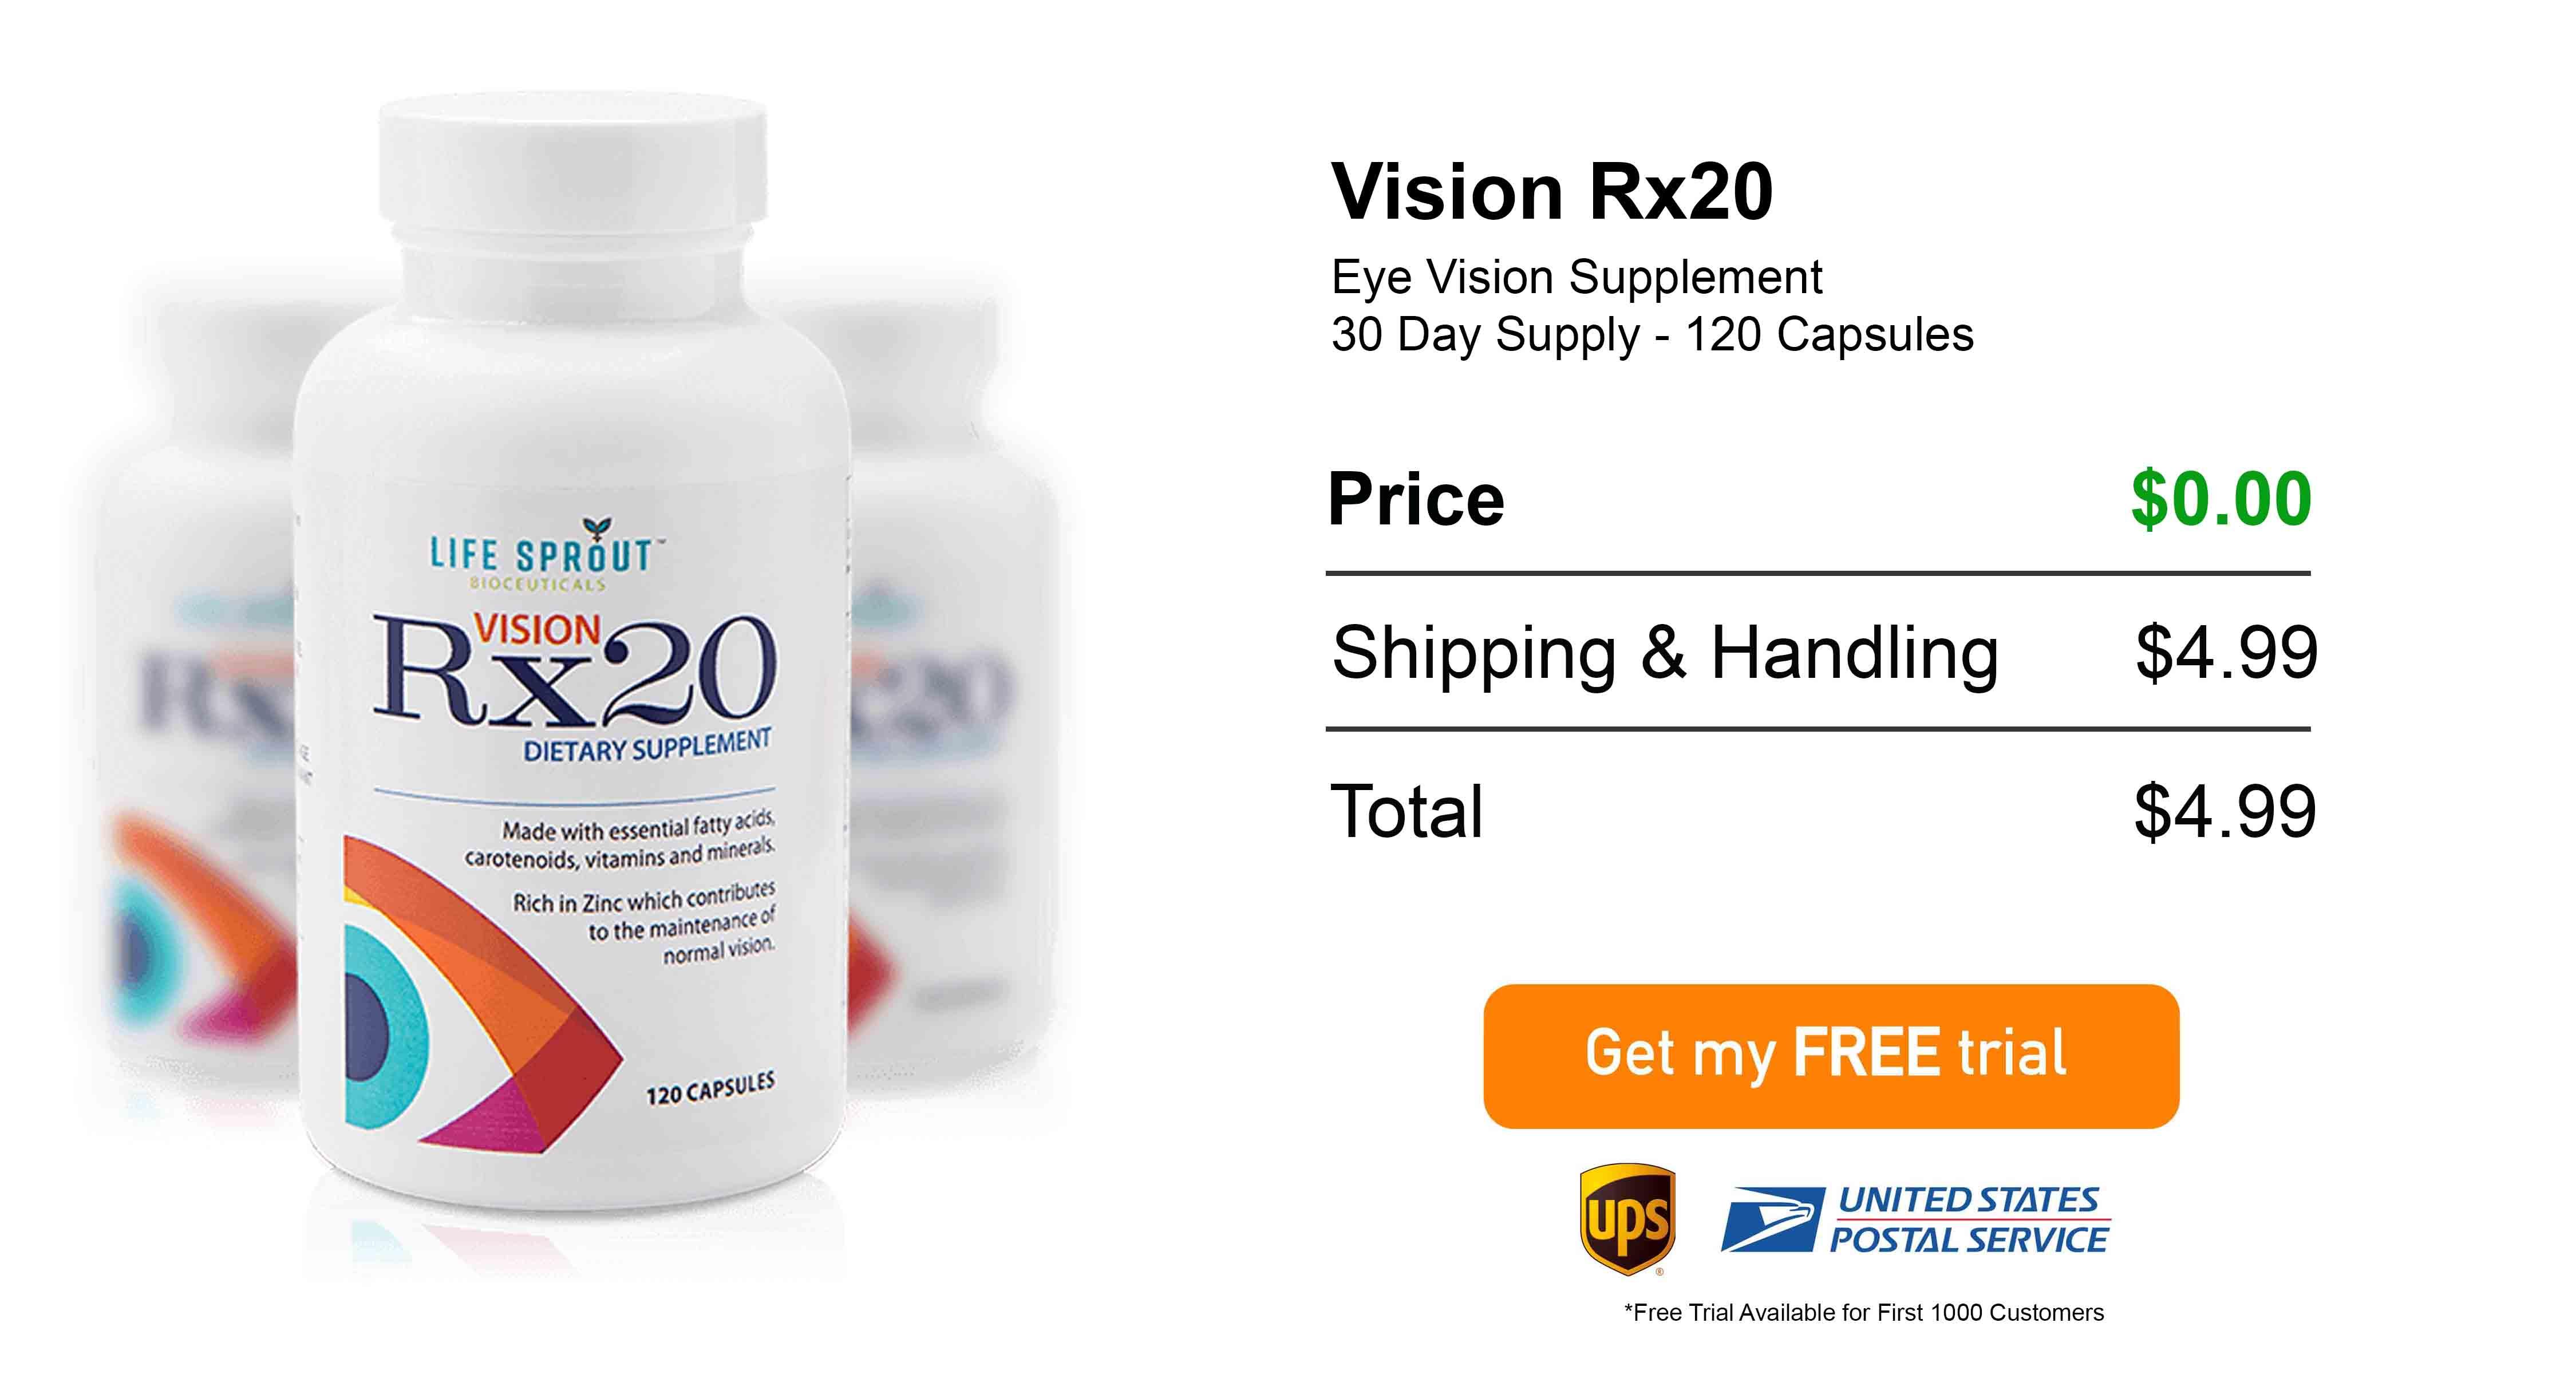 Vision Rx20 Free Trial